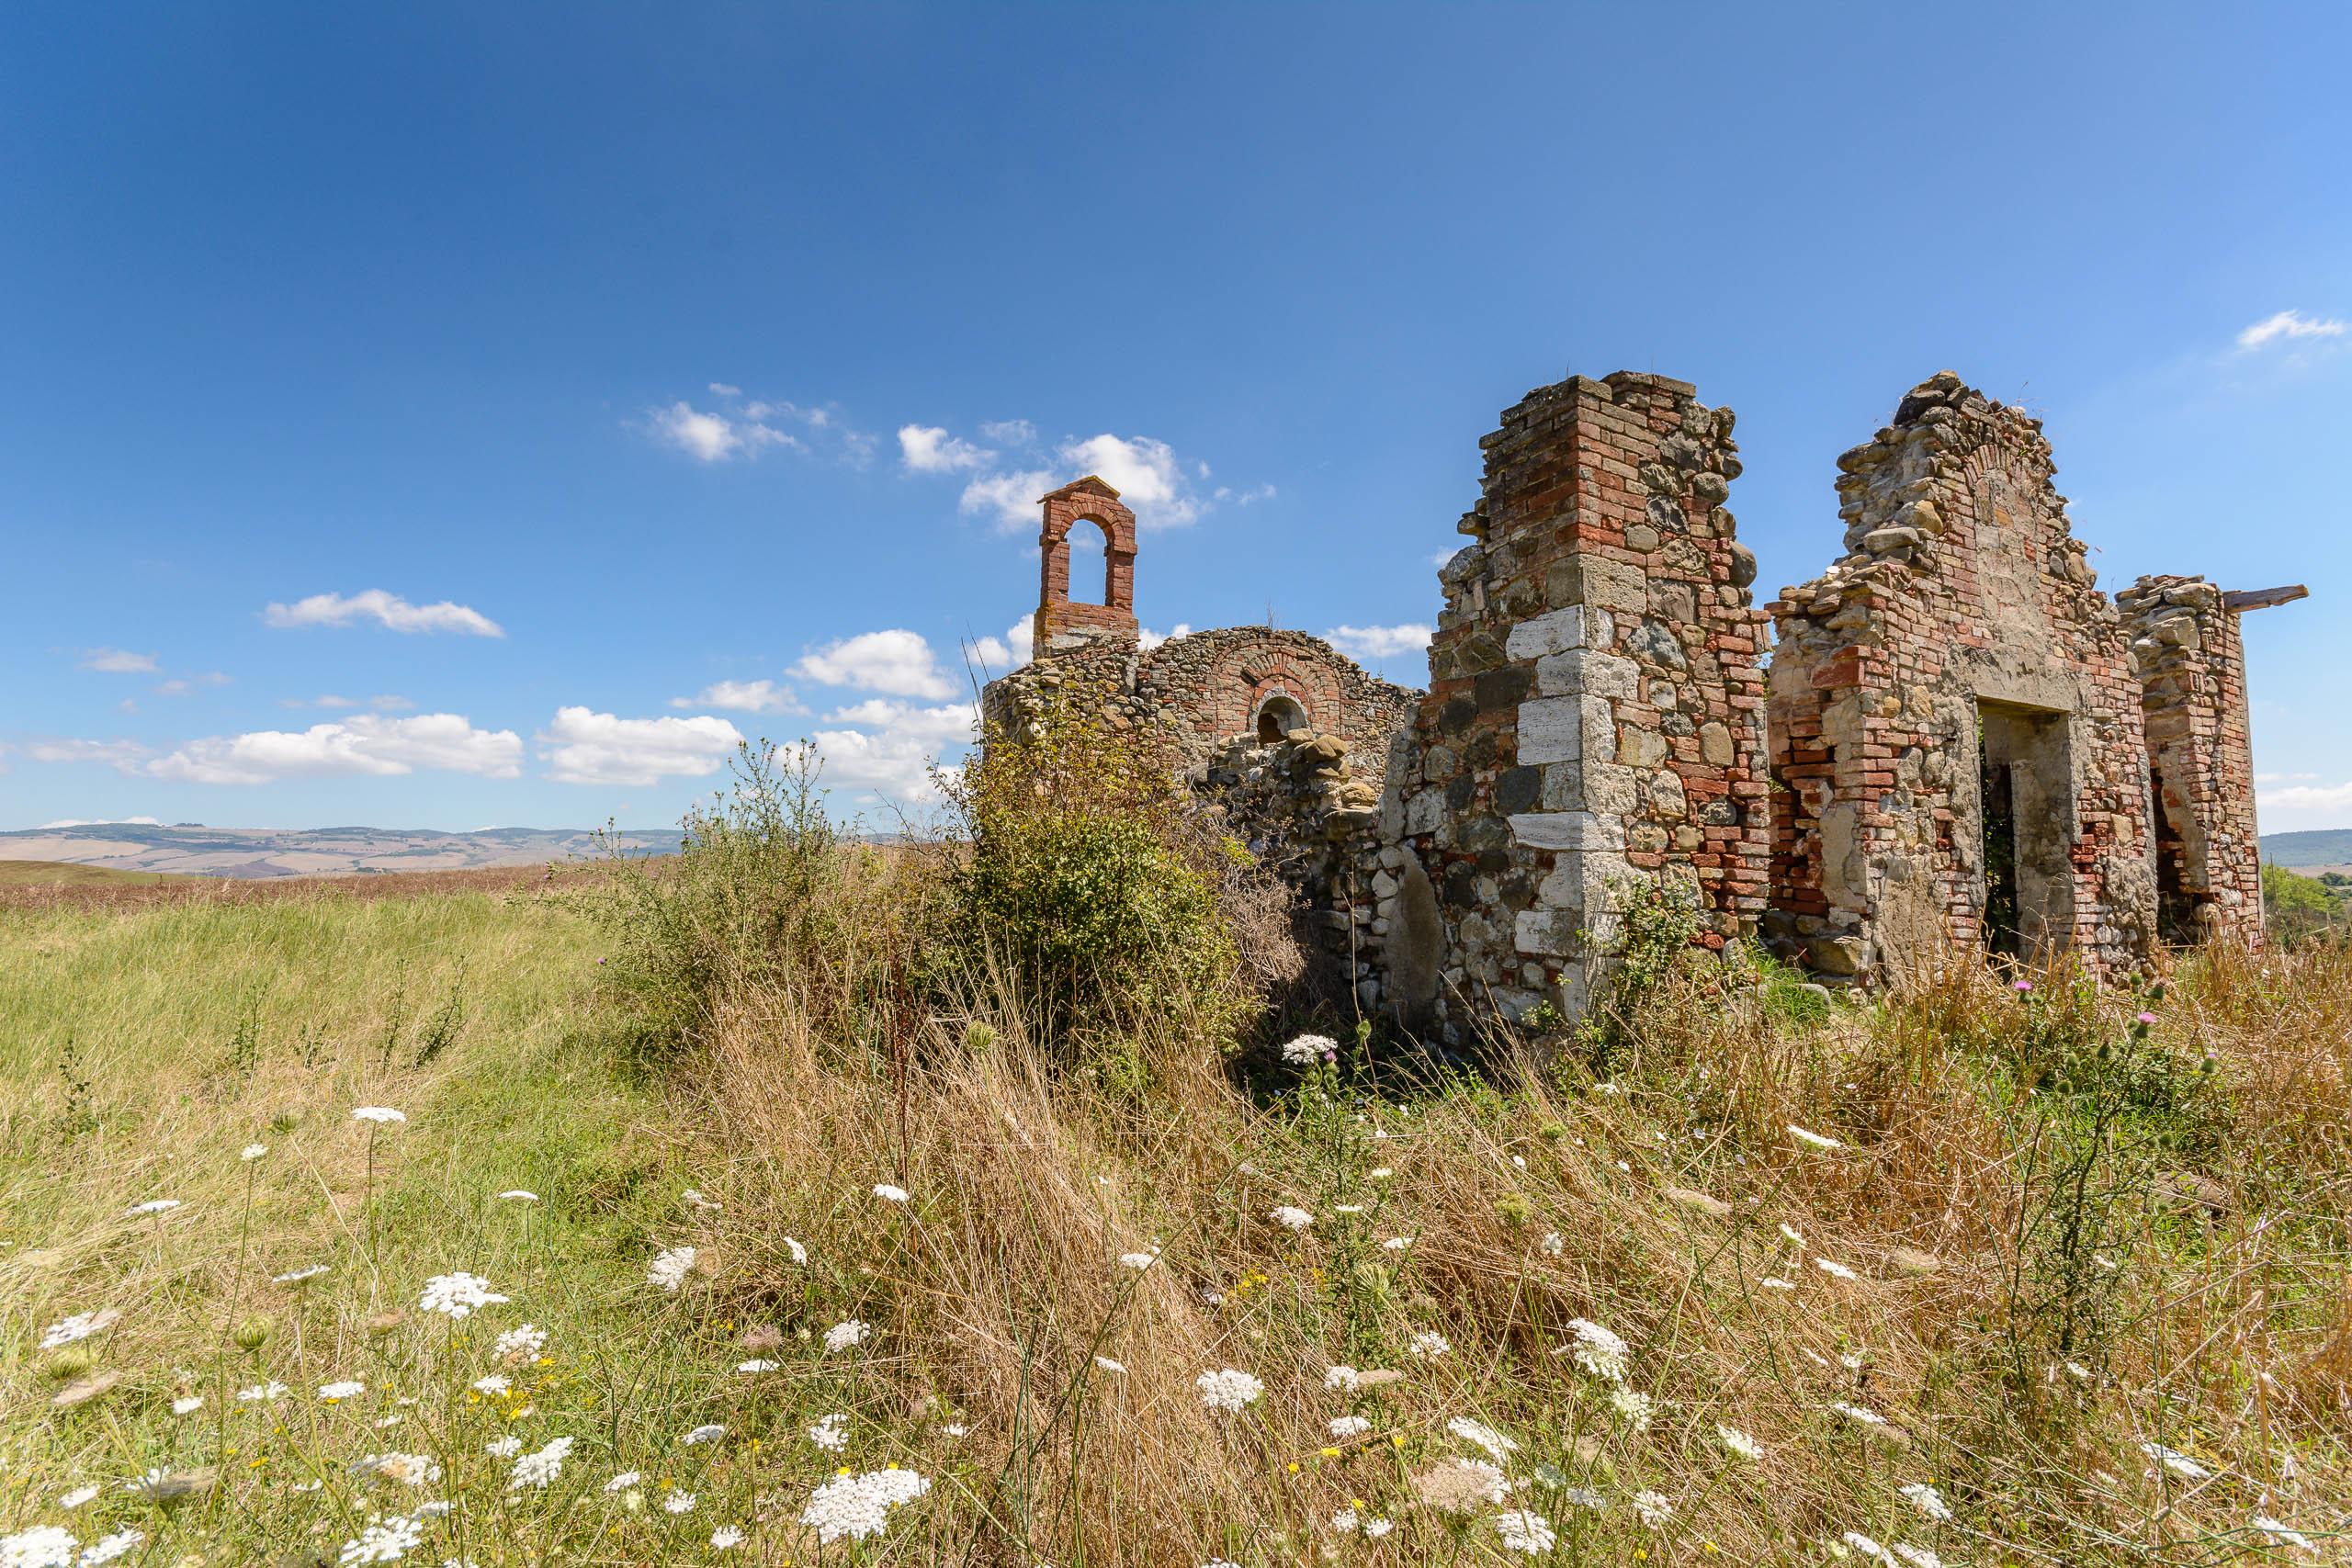 Ruine,toskana,sommer,himmel,blau,wiese,feld